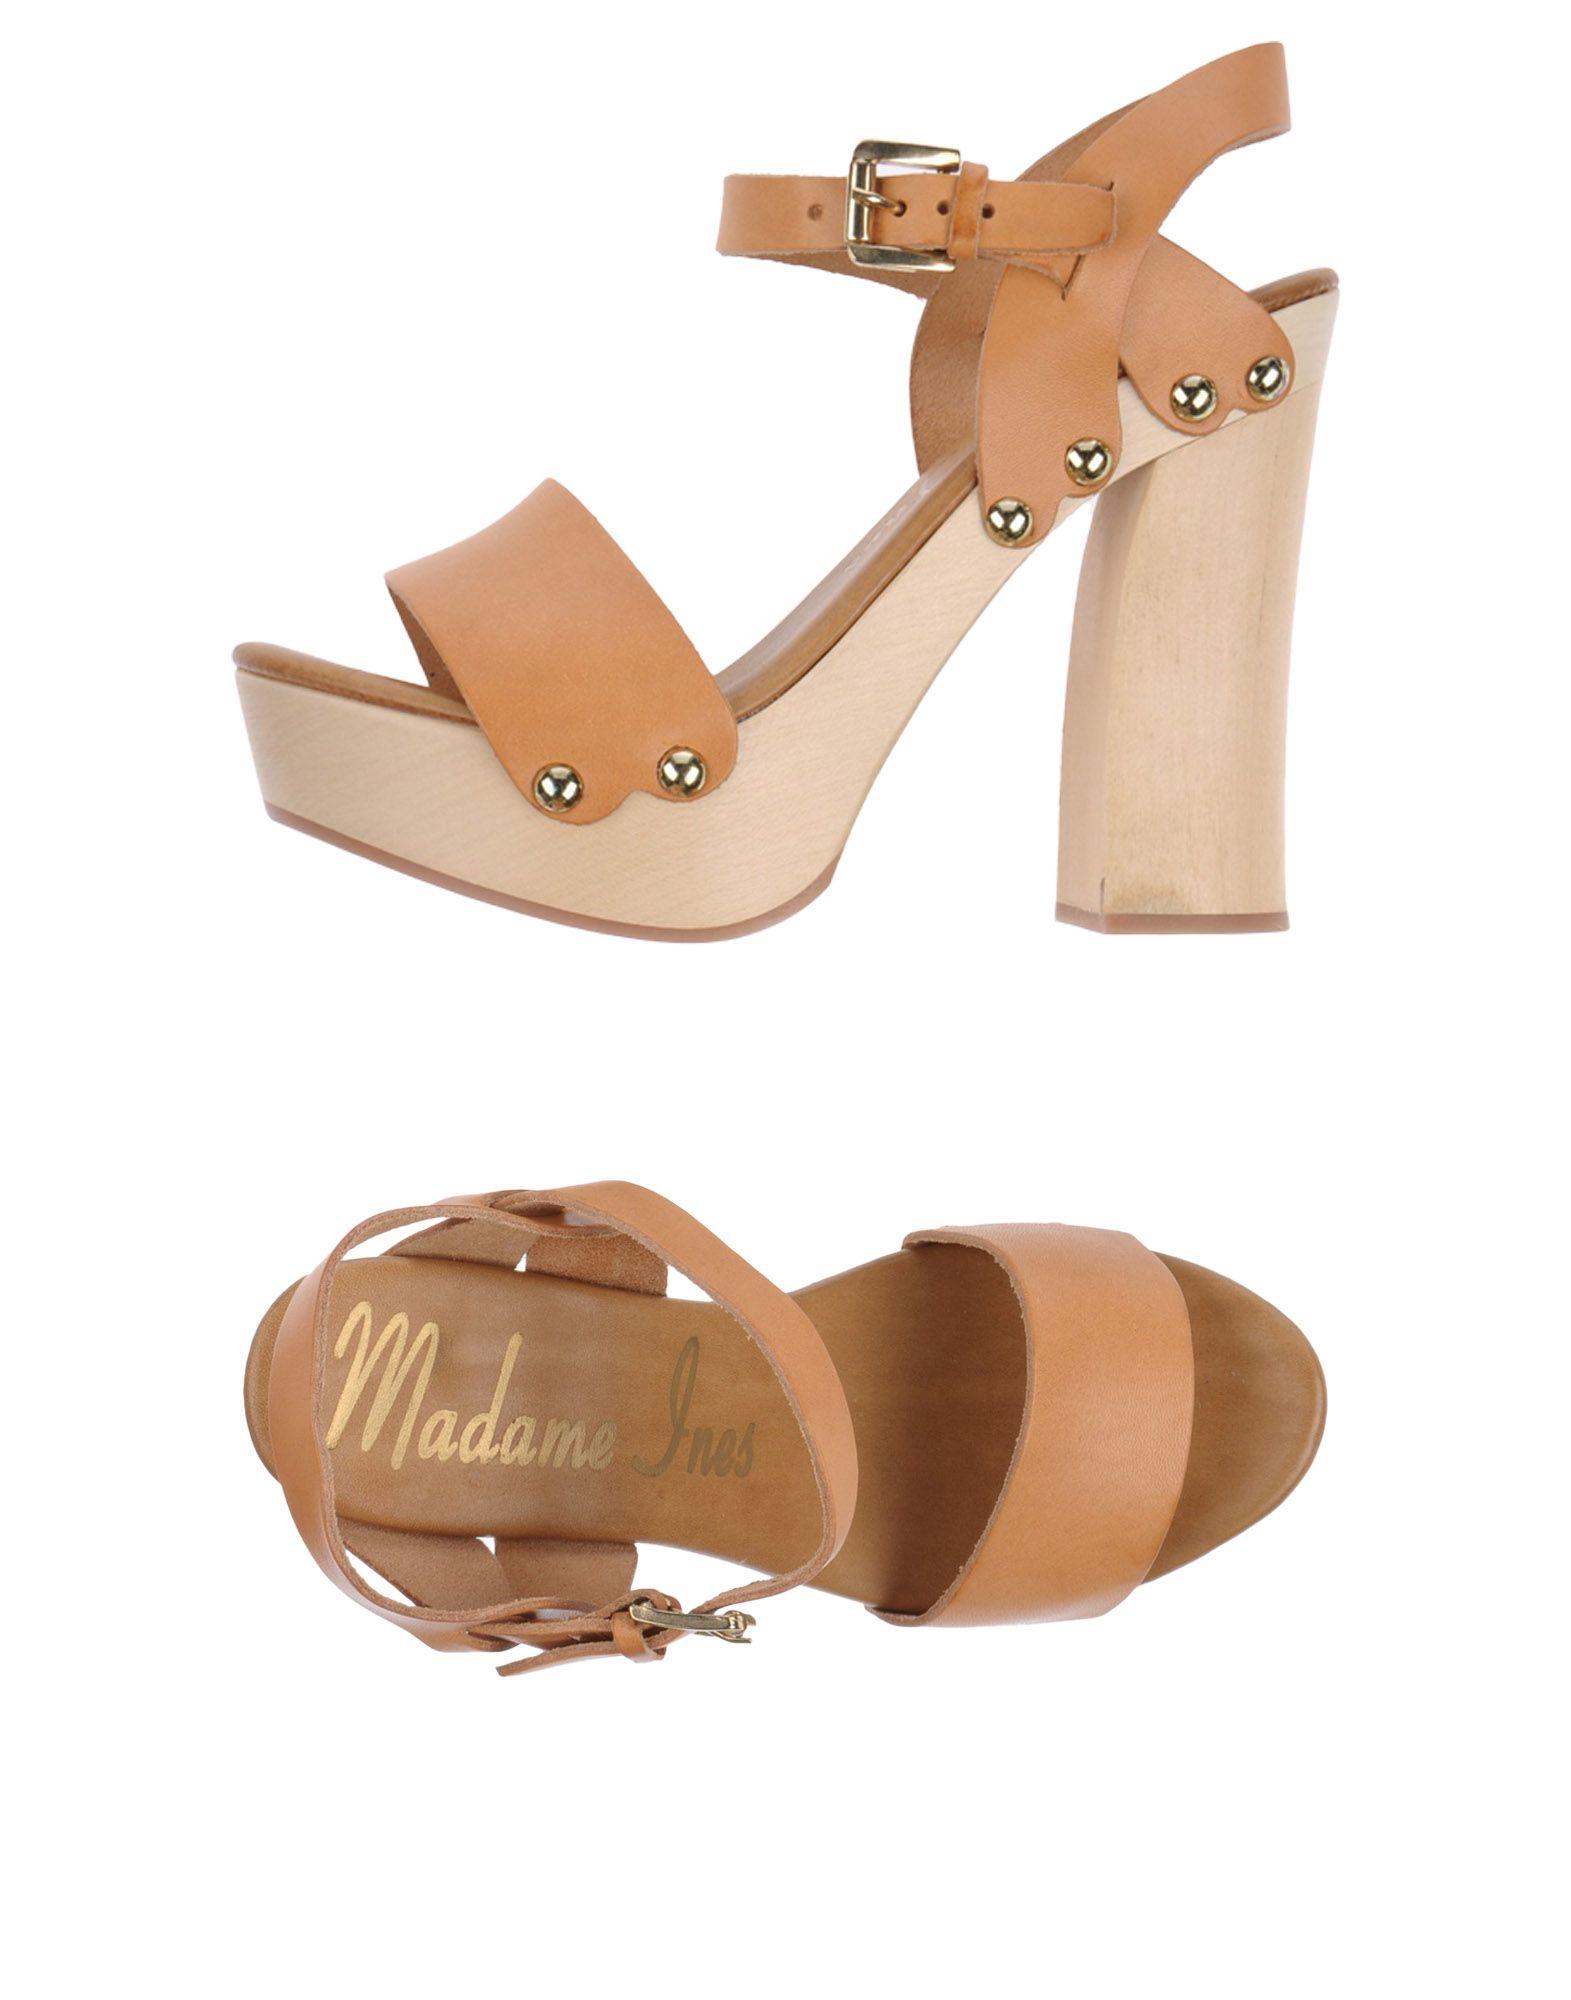 Sandali Madame Ines Donna - 11172139XX 11172139XX - b9340d